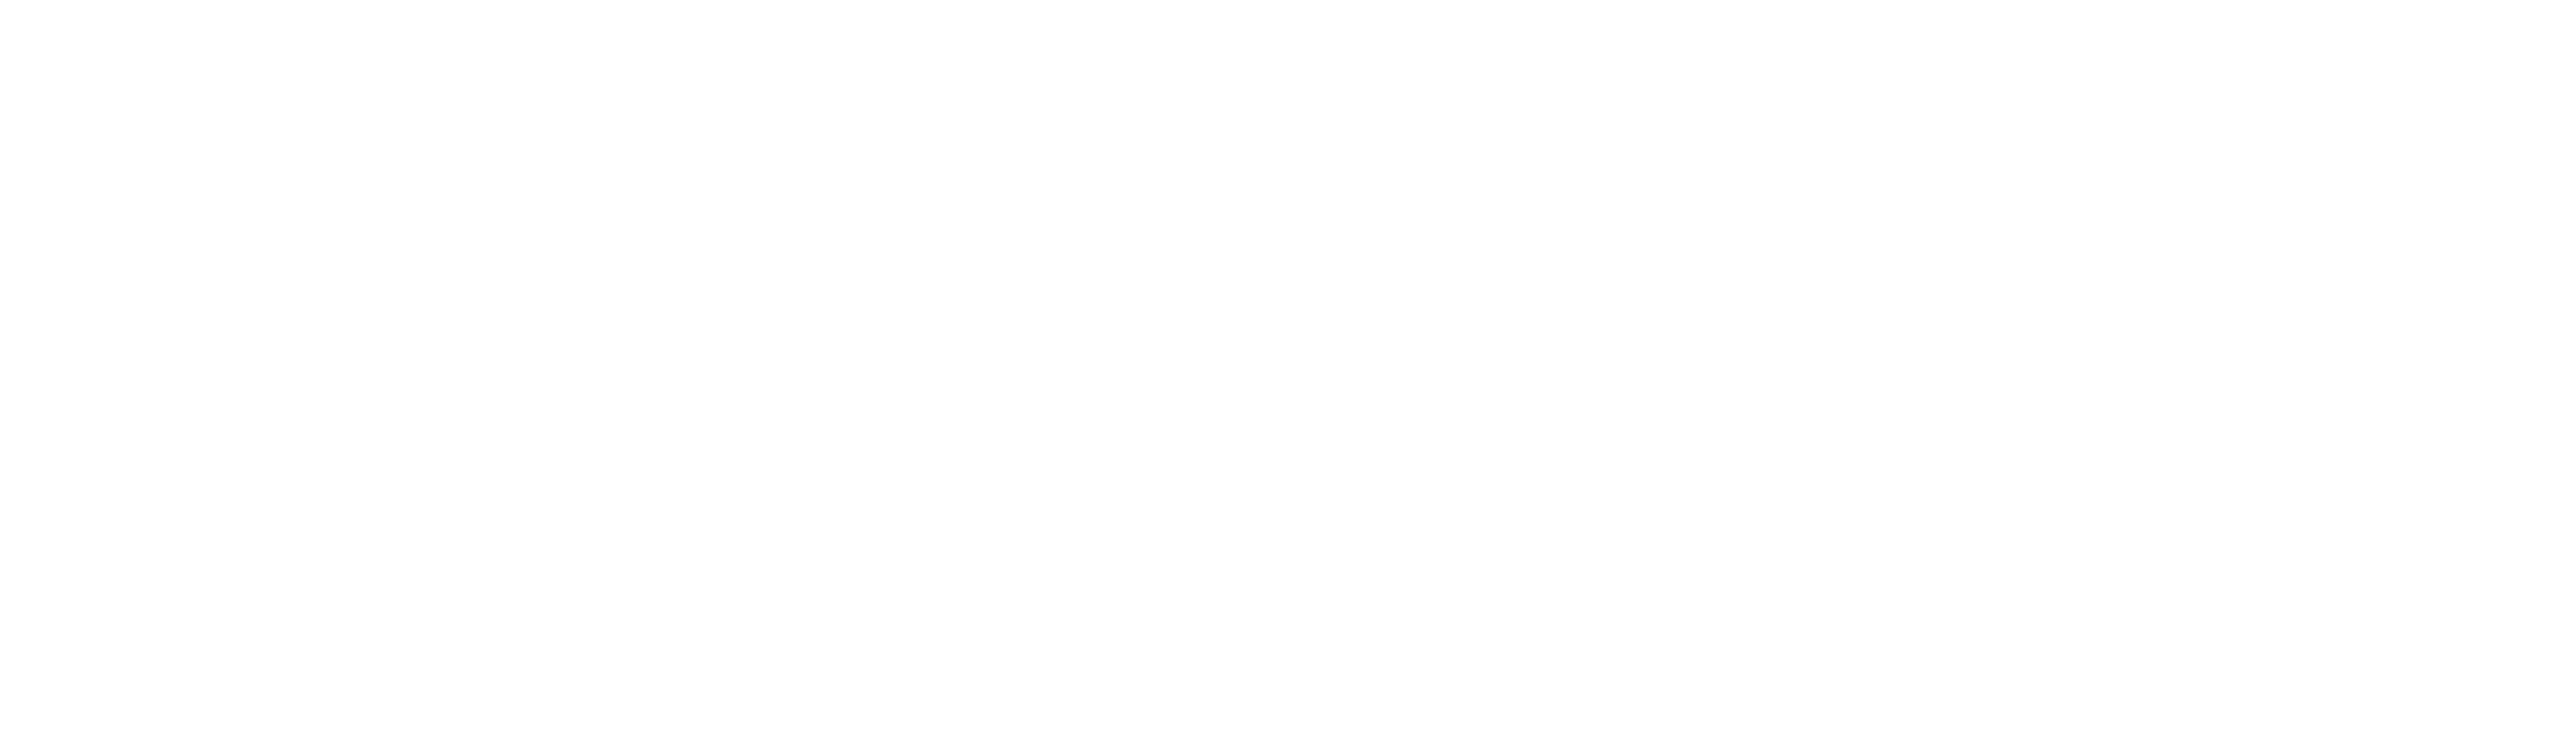 Endora.cz Freehosting - webhosting zdarma - multihosting